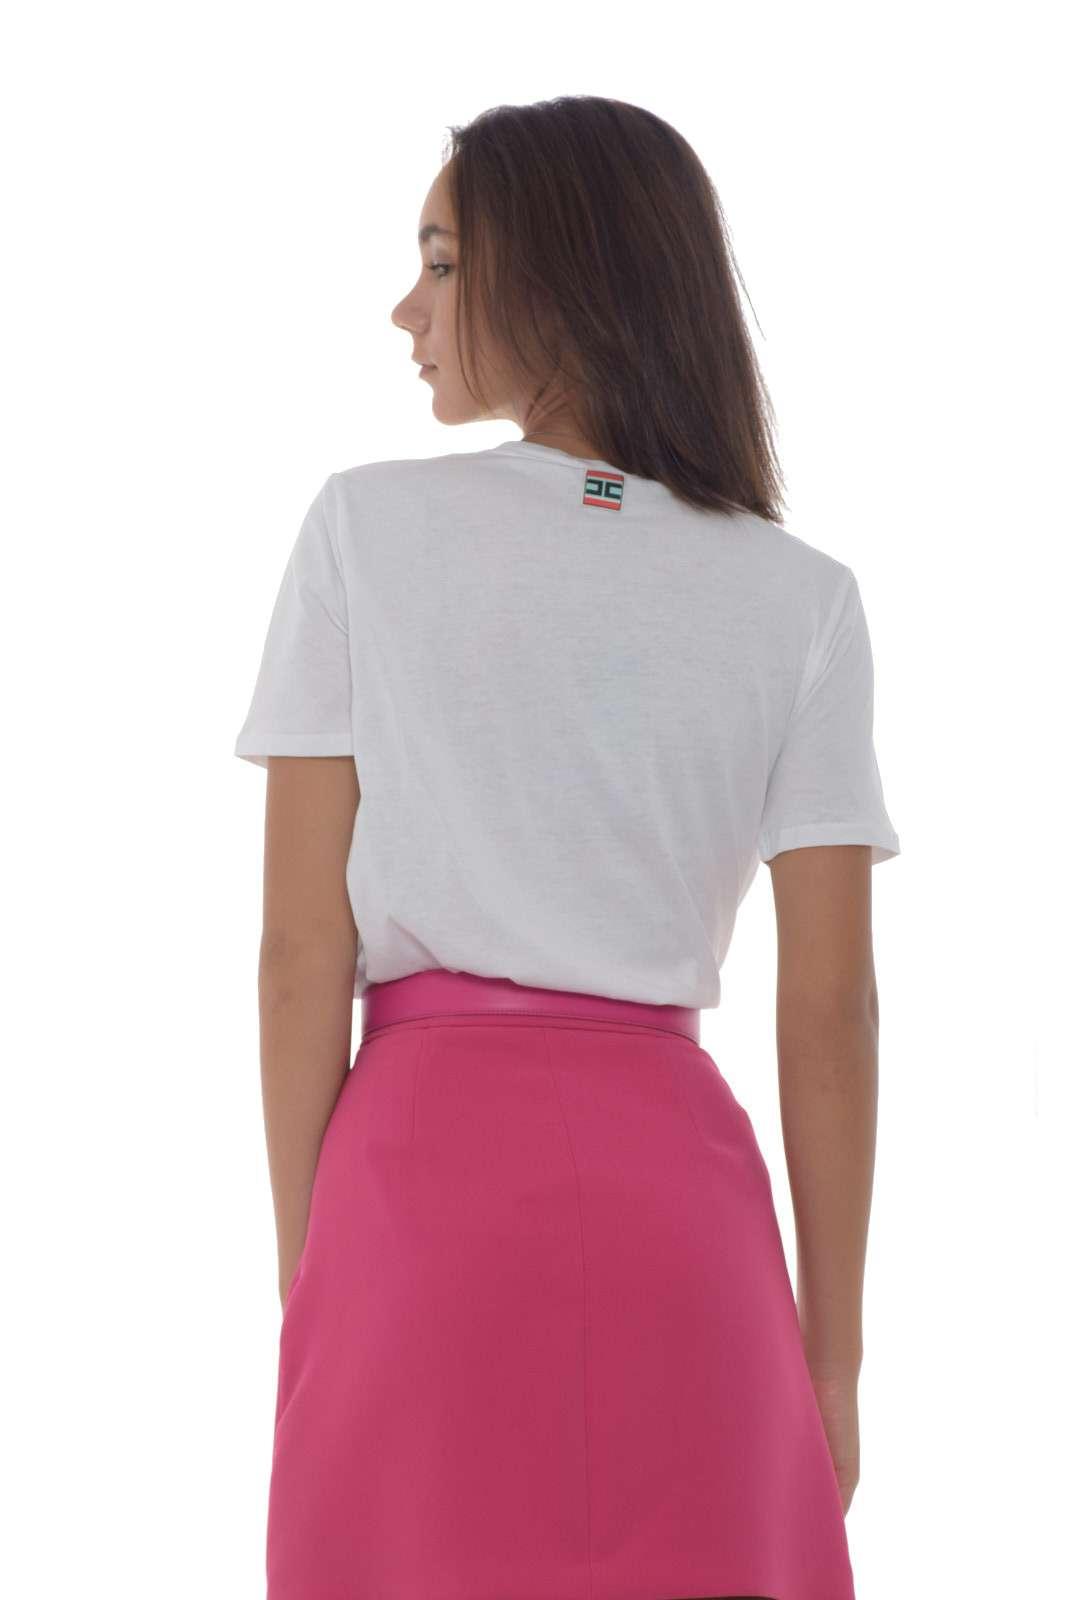 https://www.parmax.com/media/catalog/product/a/i/AI-outlet_parmax-t-shirt-donna-Elisabetta-Franchi-MA13496E2-C.jpg